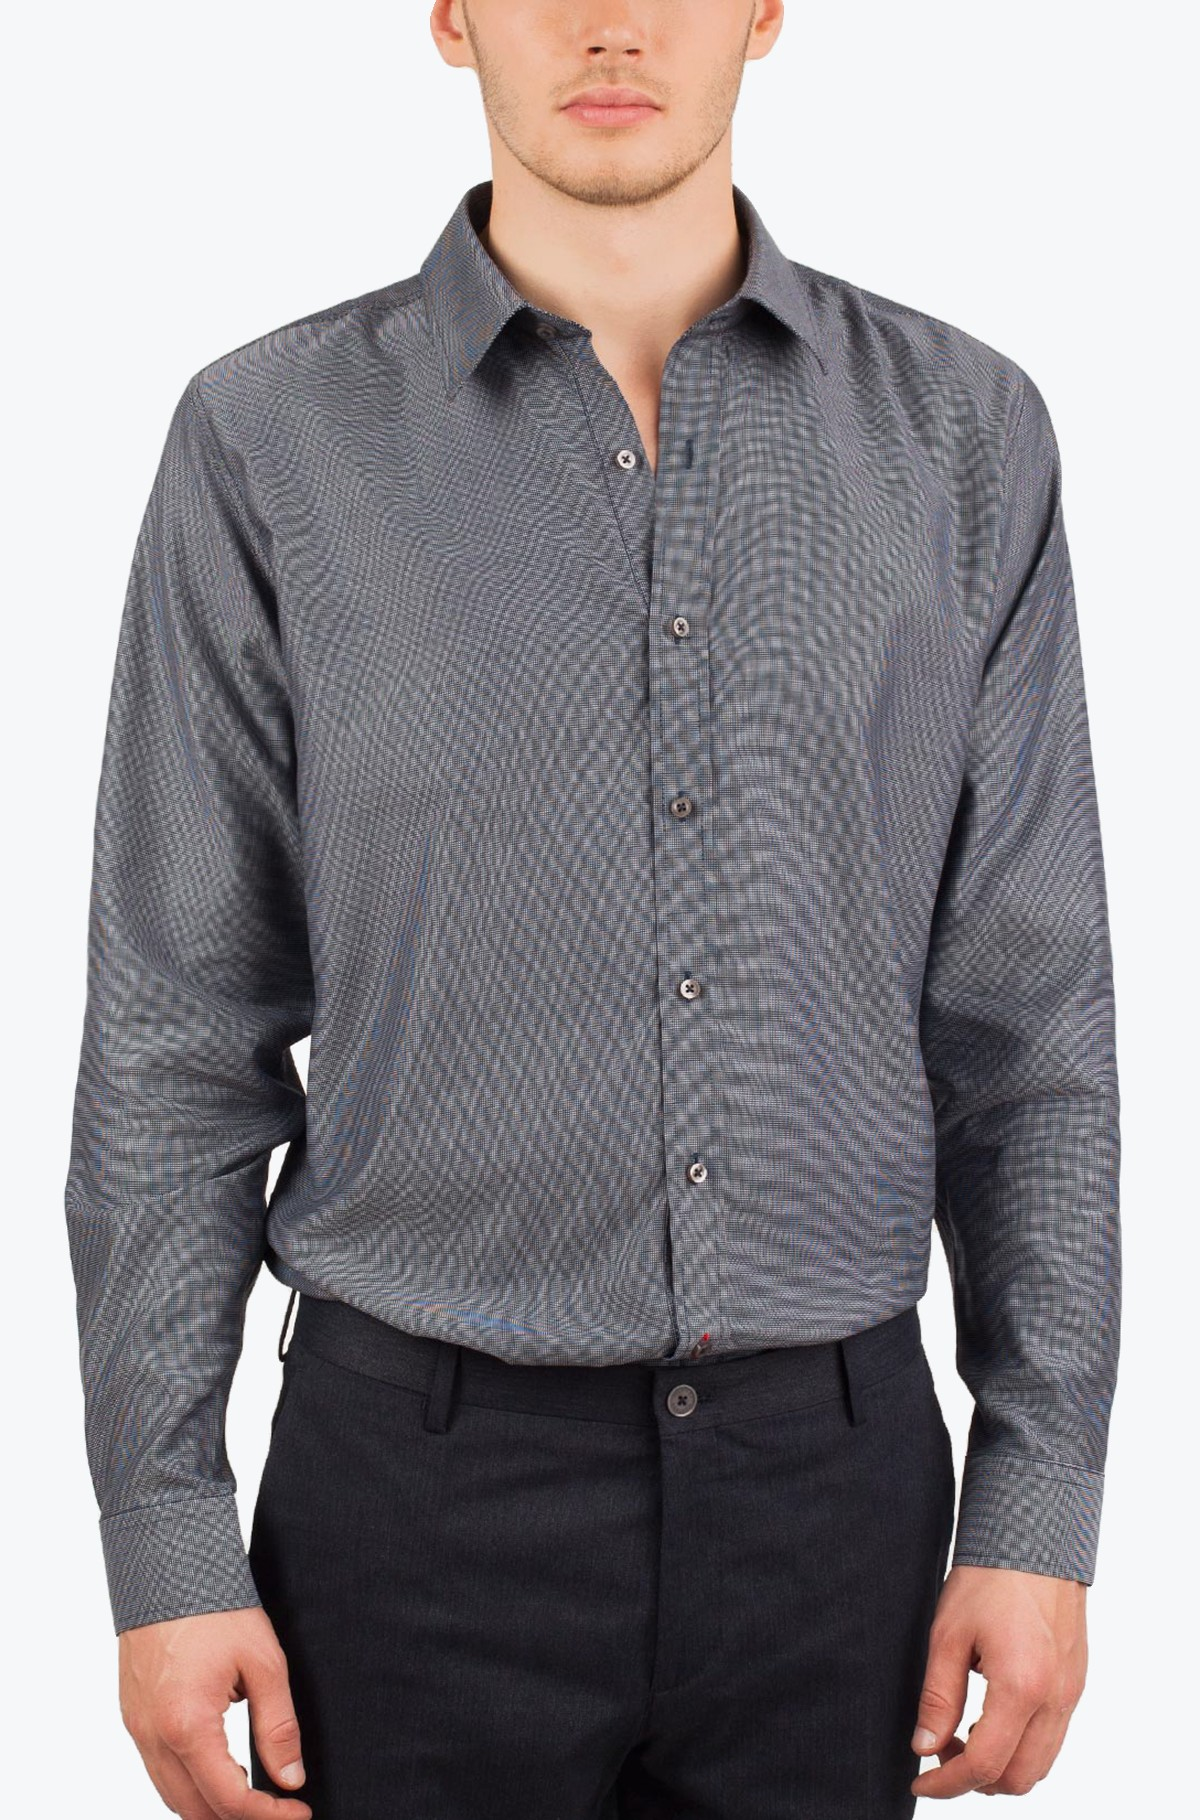 Marškiniai Sten-full-1